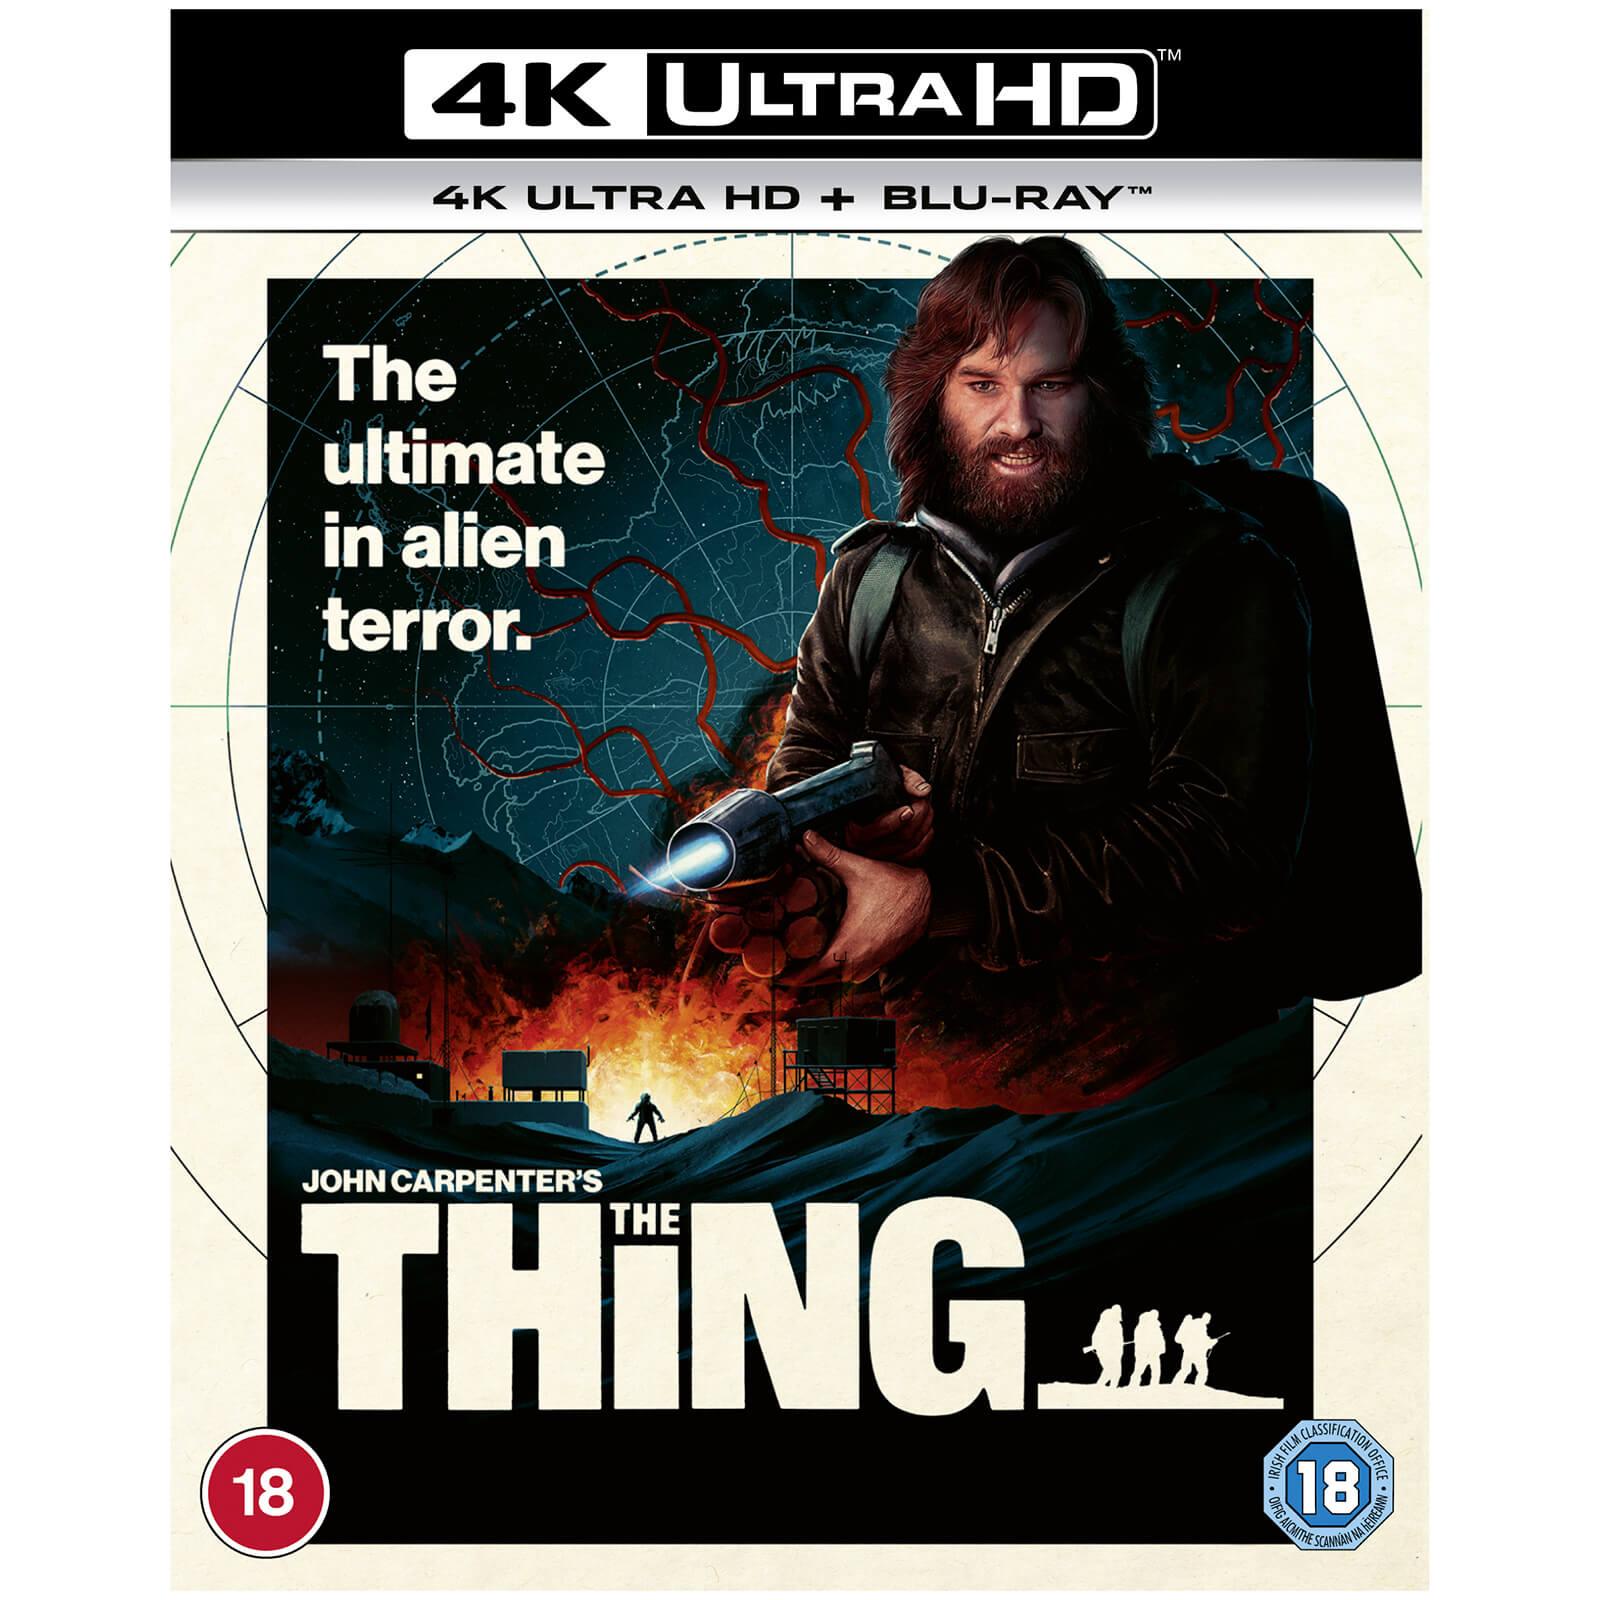 The Thing - 4K Ultra HD